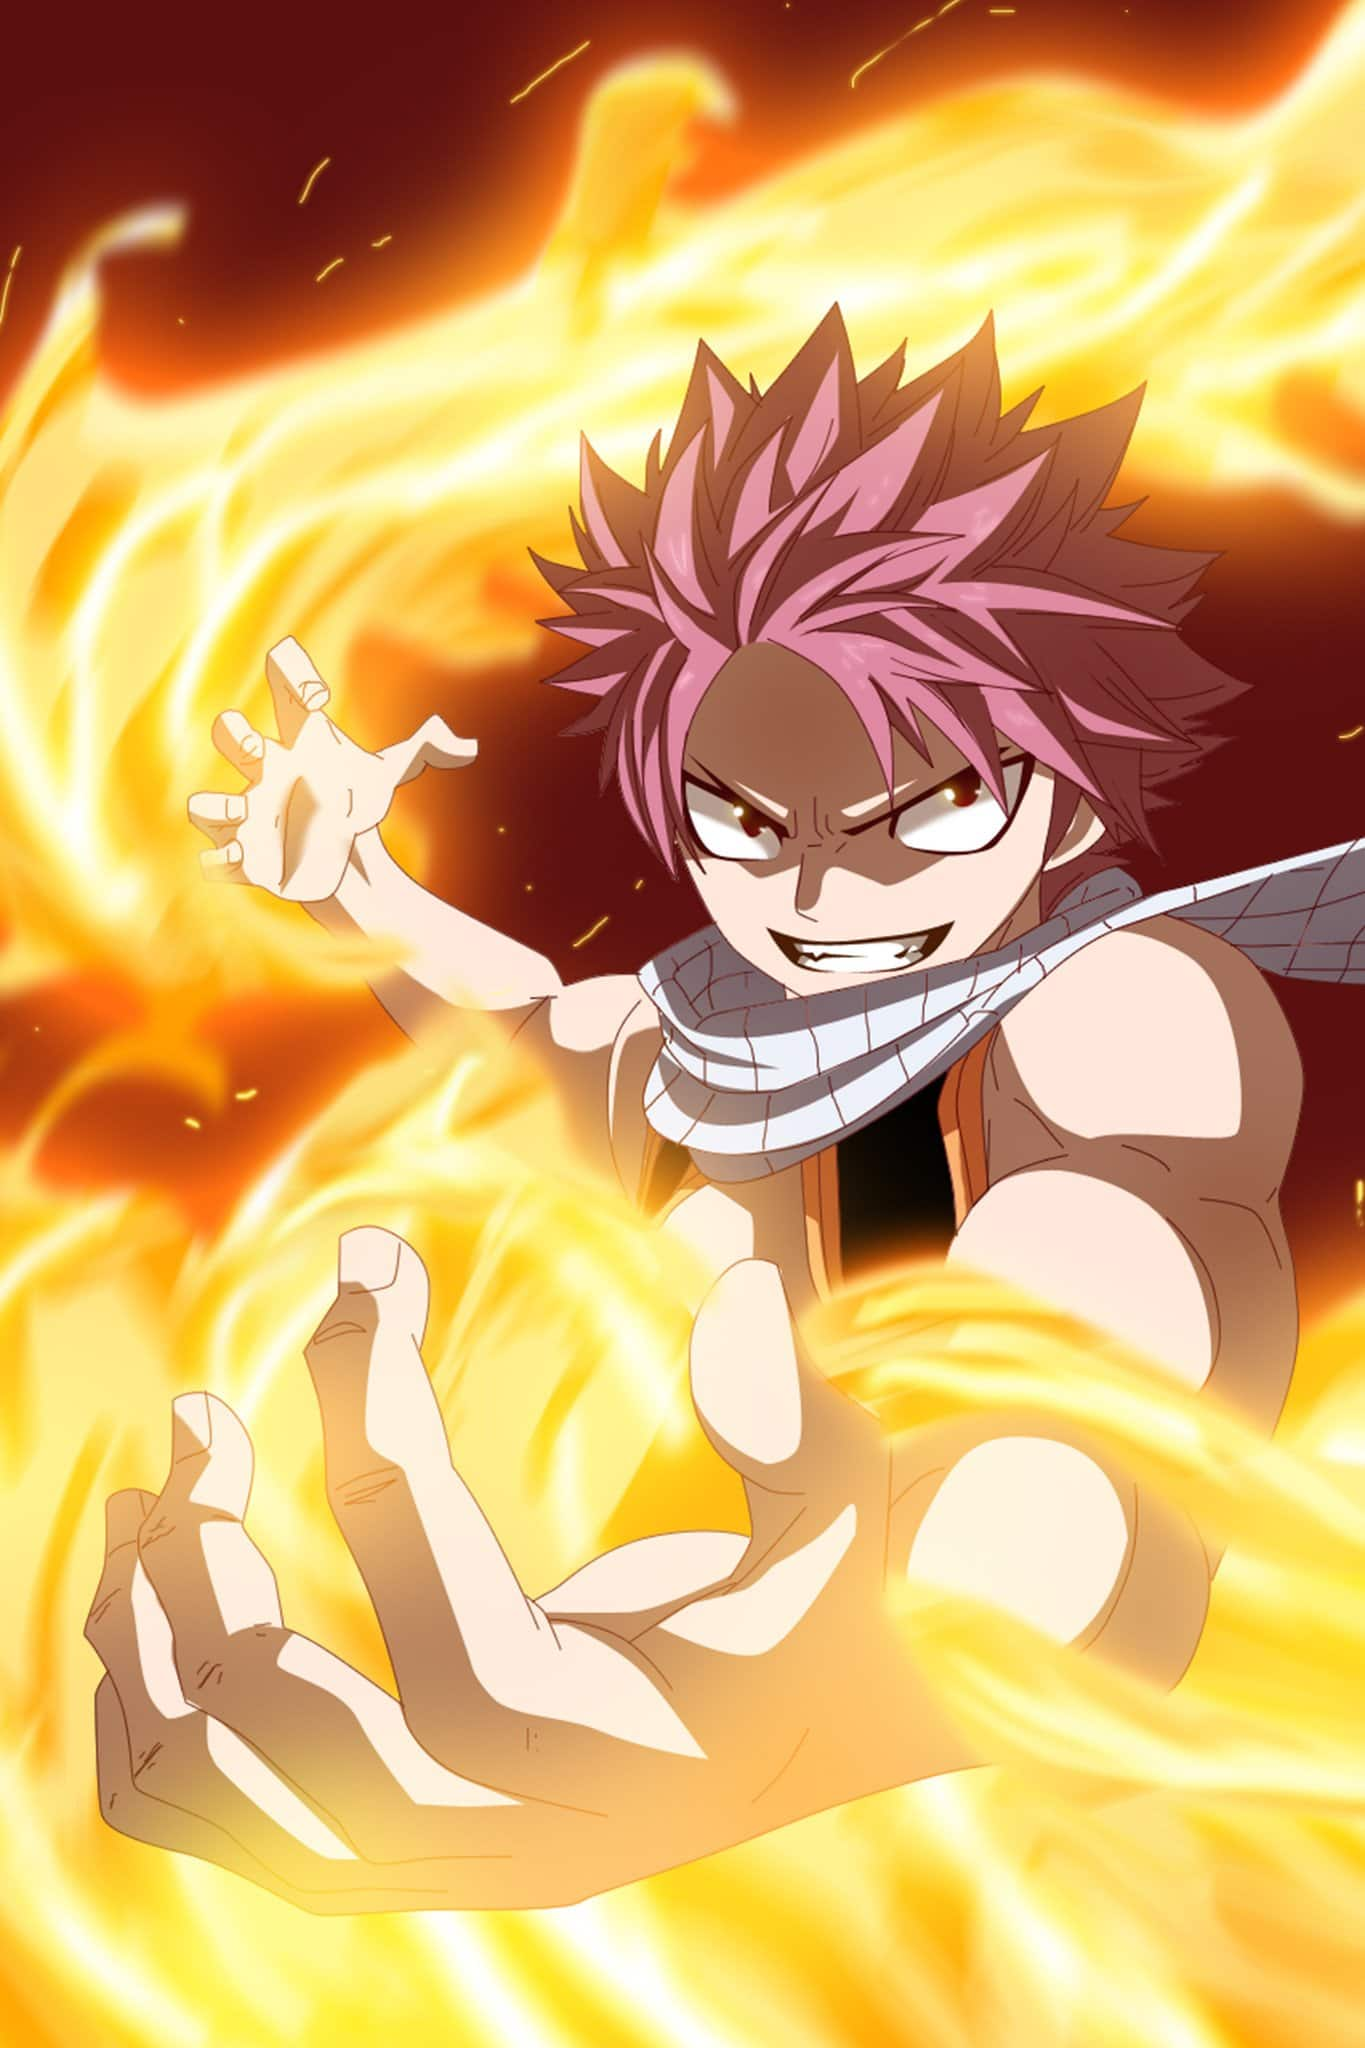 Amazon Digital - Fairy Tail, Season 1, Part 1 FREE